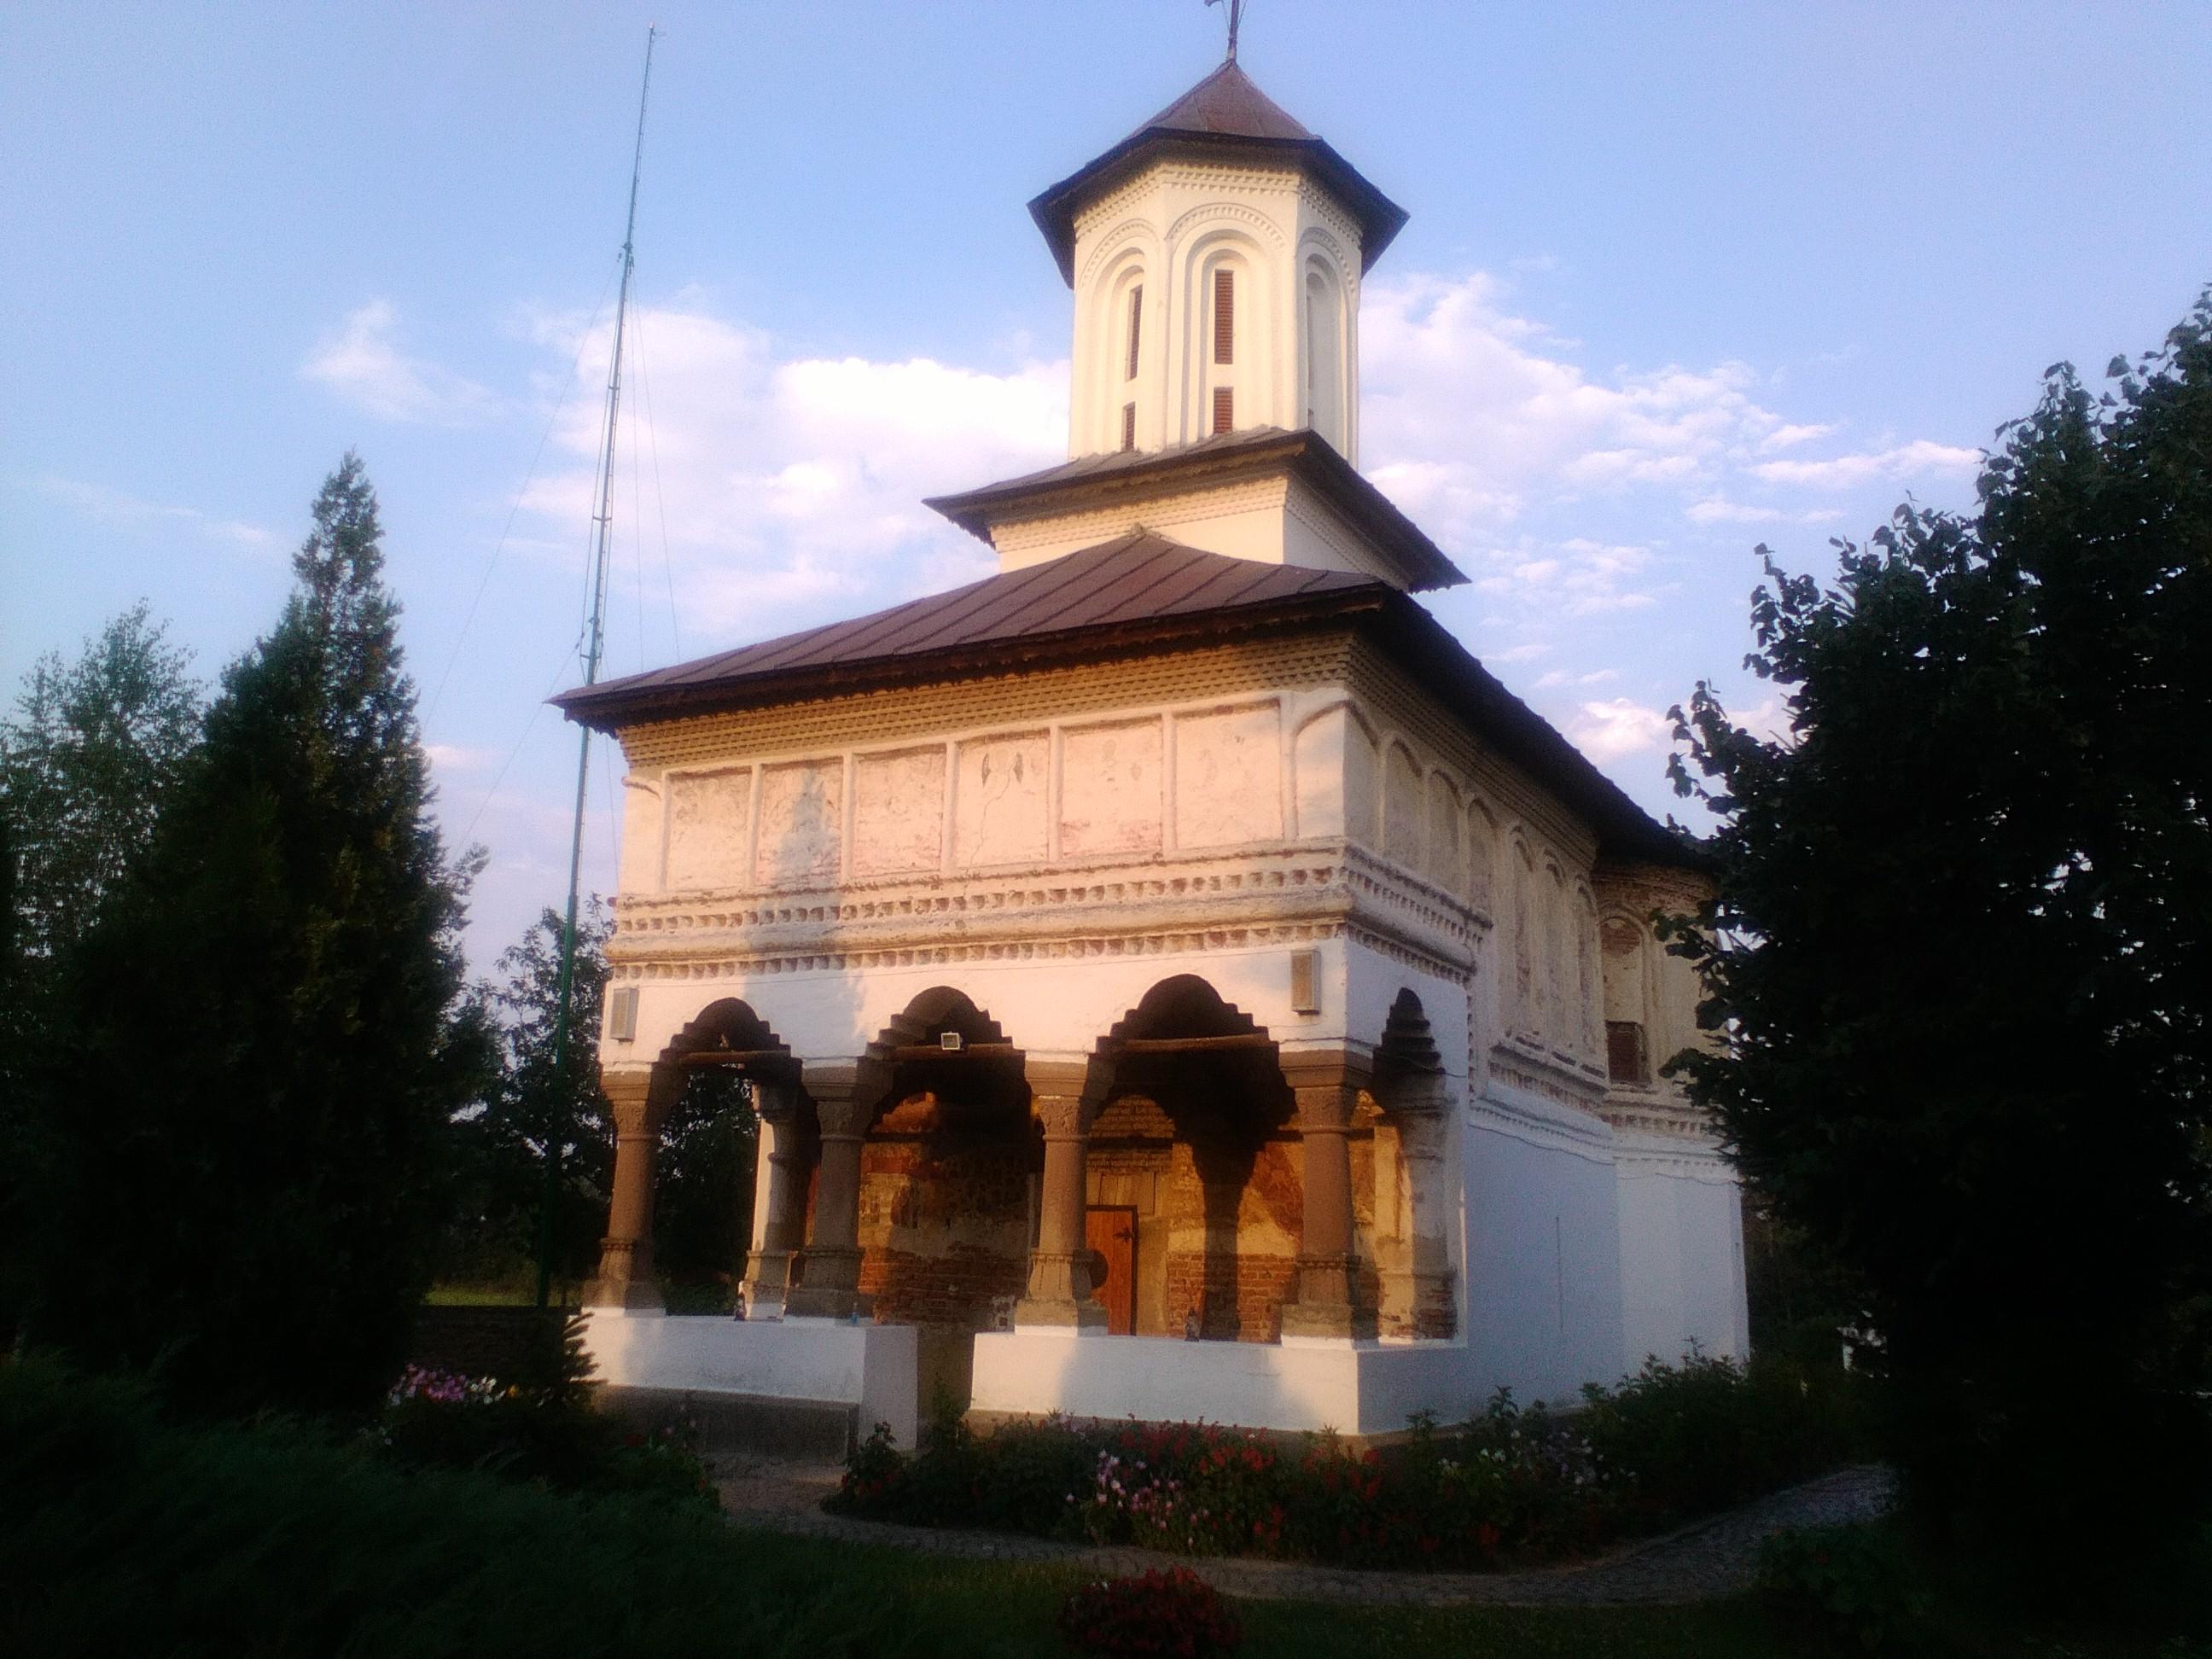 Manastirea Carbunesti